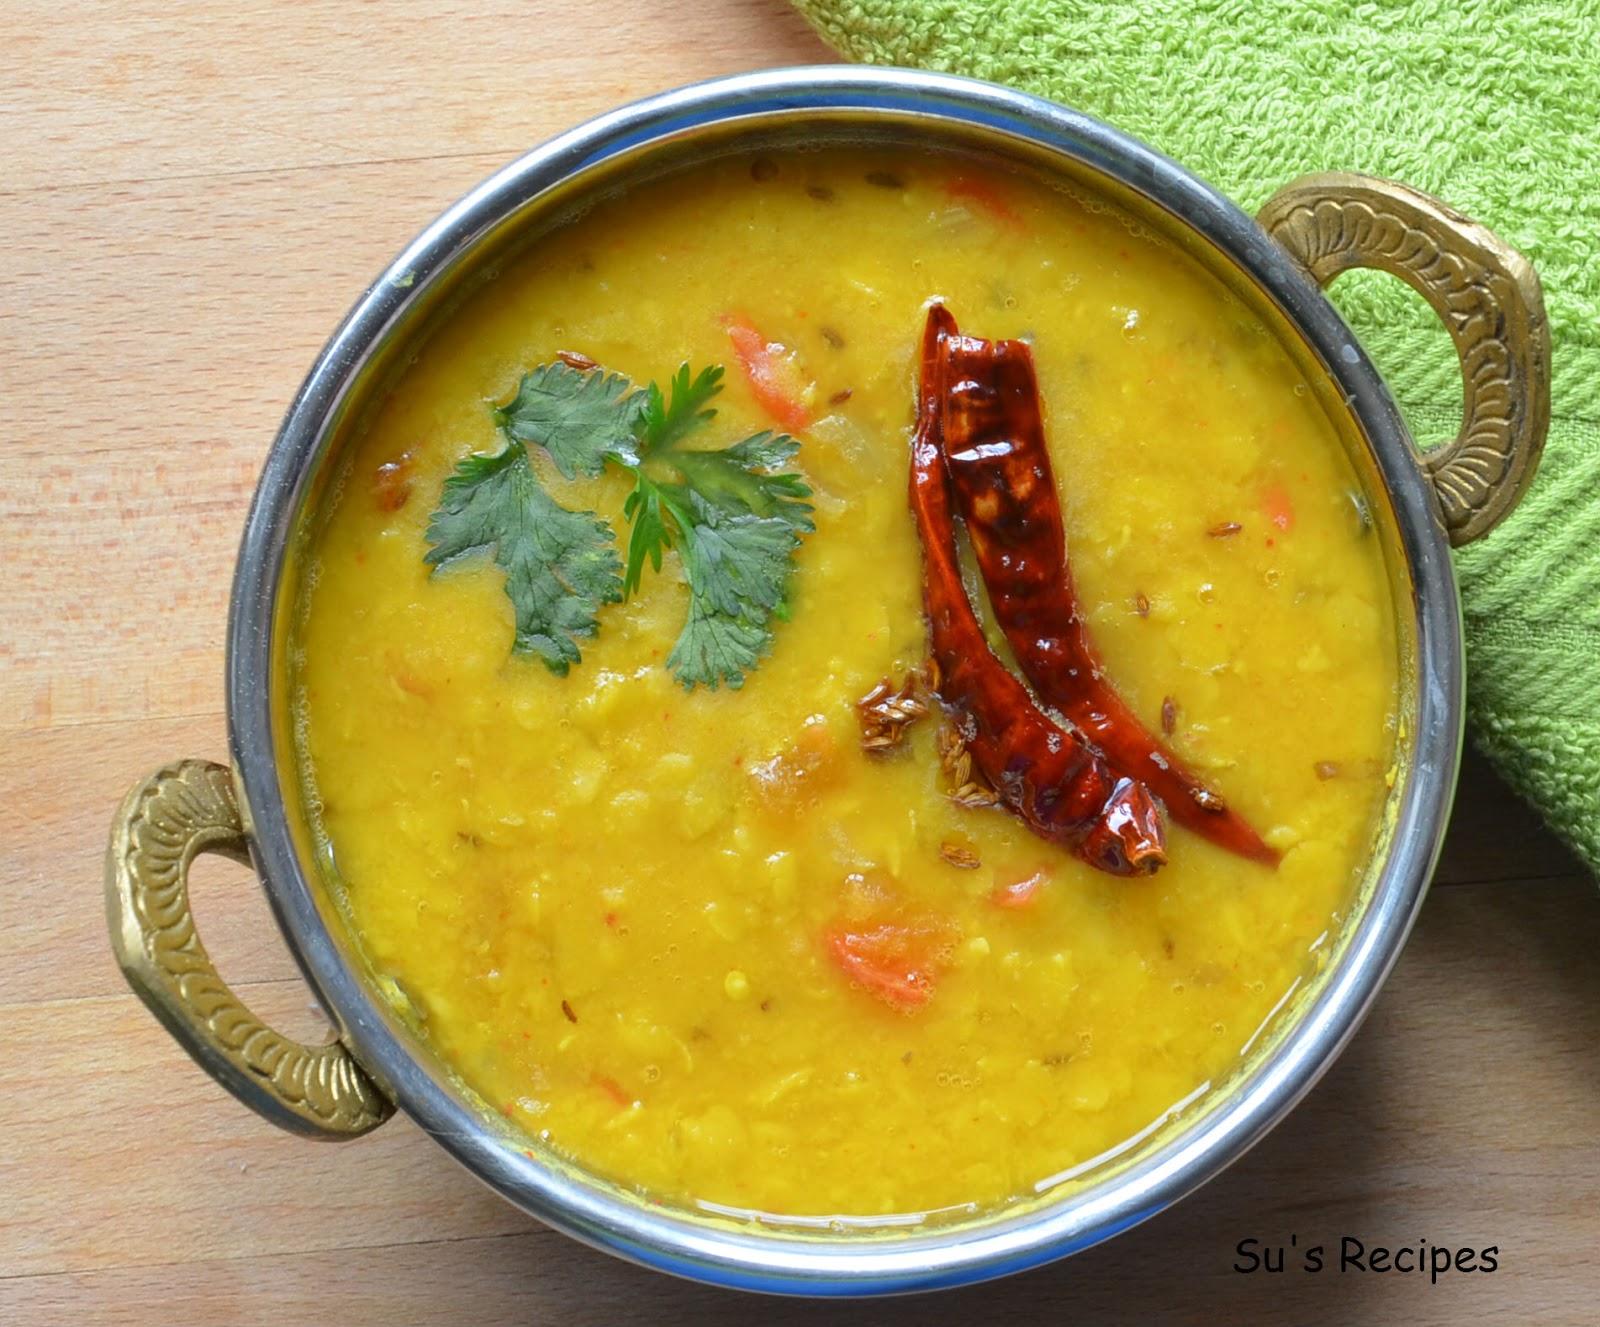 Su's Recipes: Malai Ko...